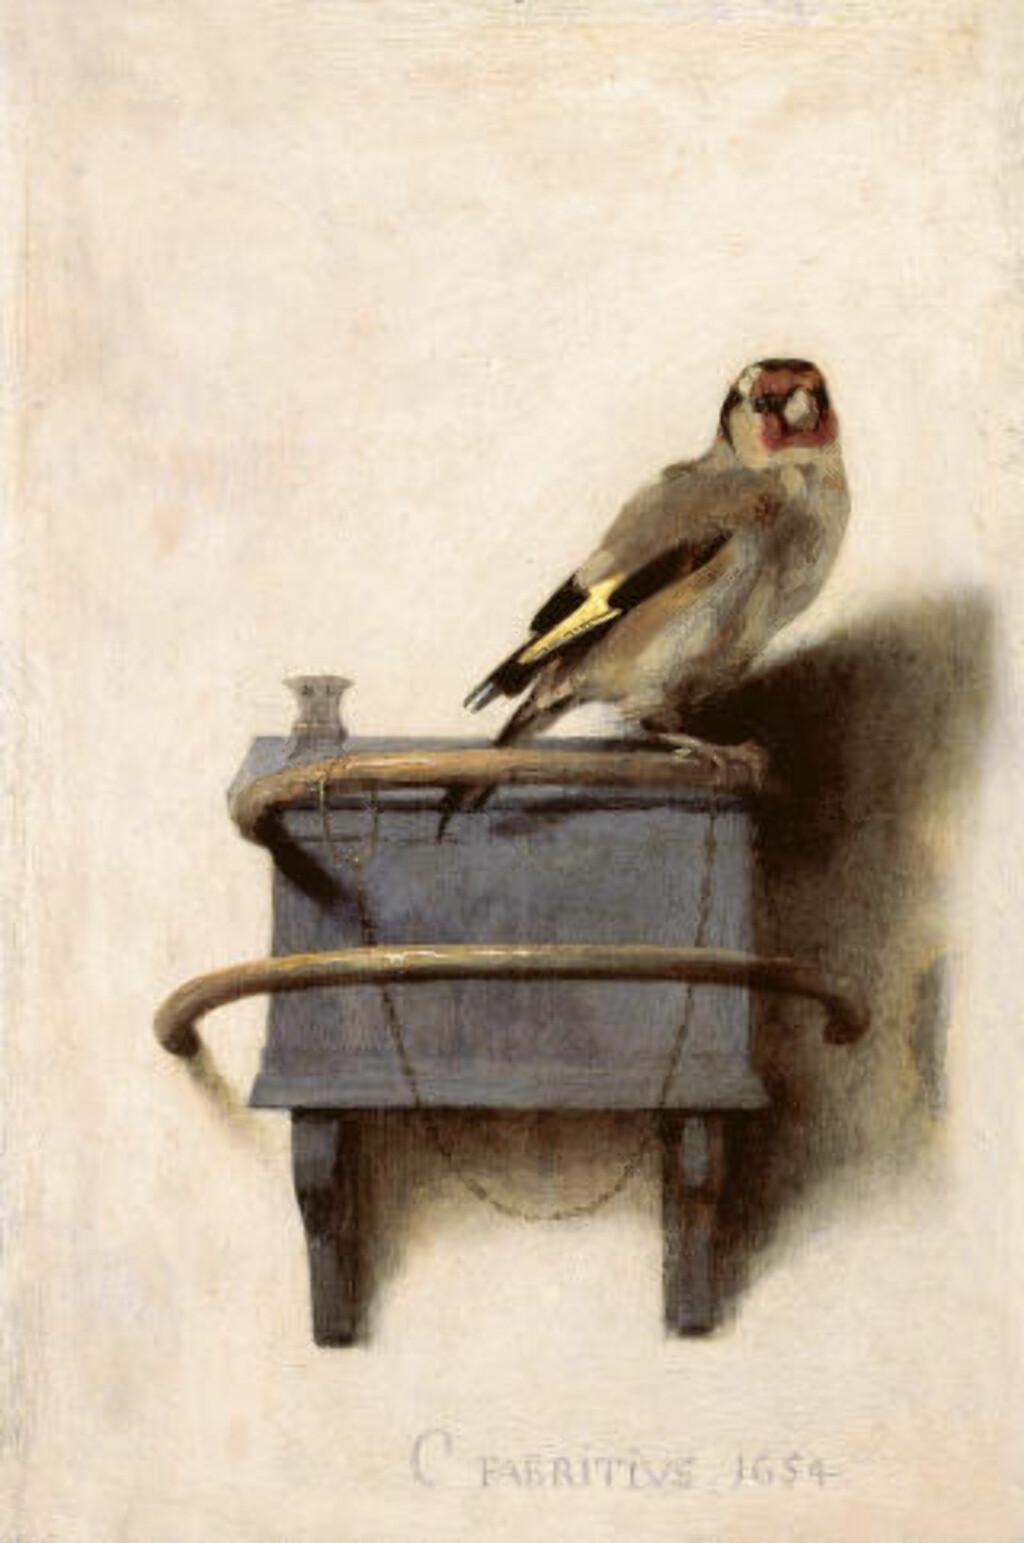 BLE BOK: Carel Fabritius malleri Het Puttertje, malt i cirka 1654 ble til krimromanen The Goldfinch i 2014. Foto: MAURITSHUIS